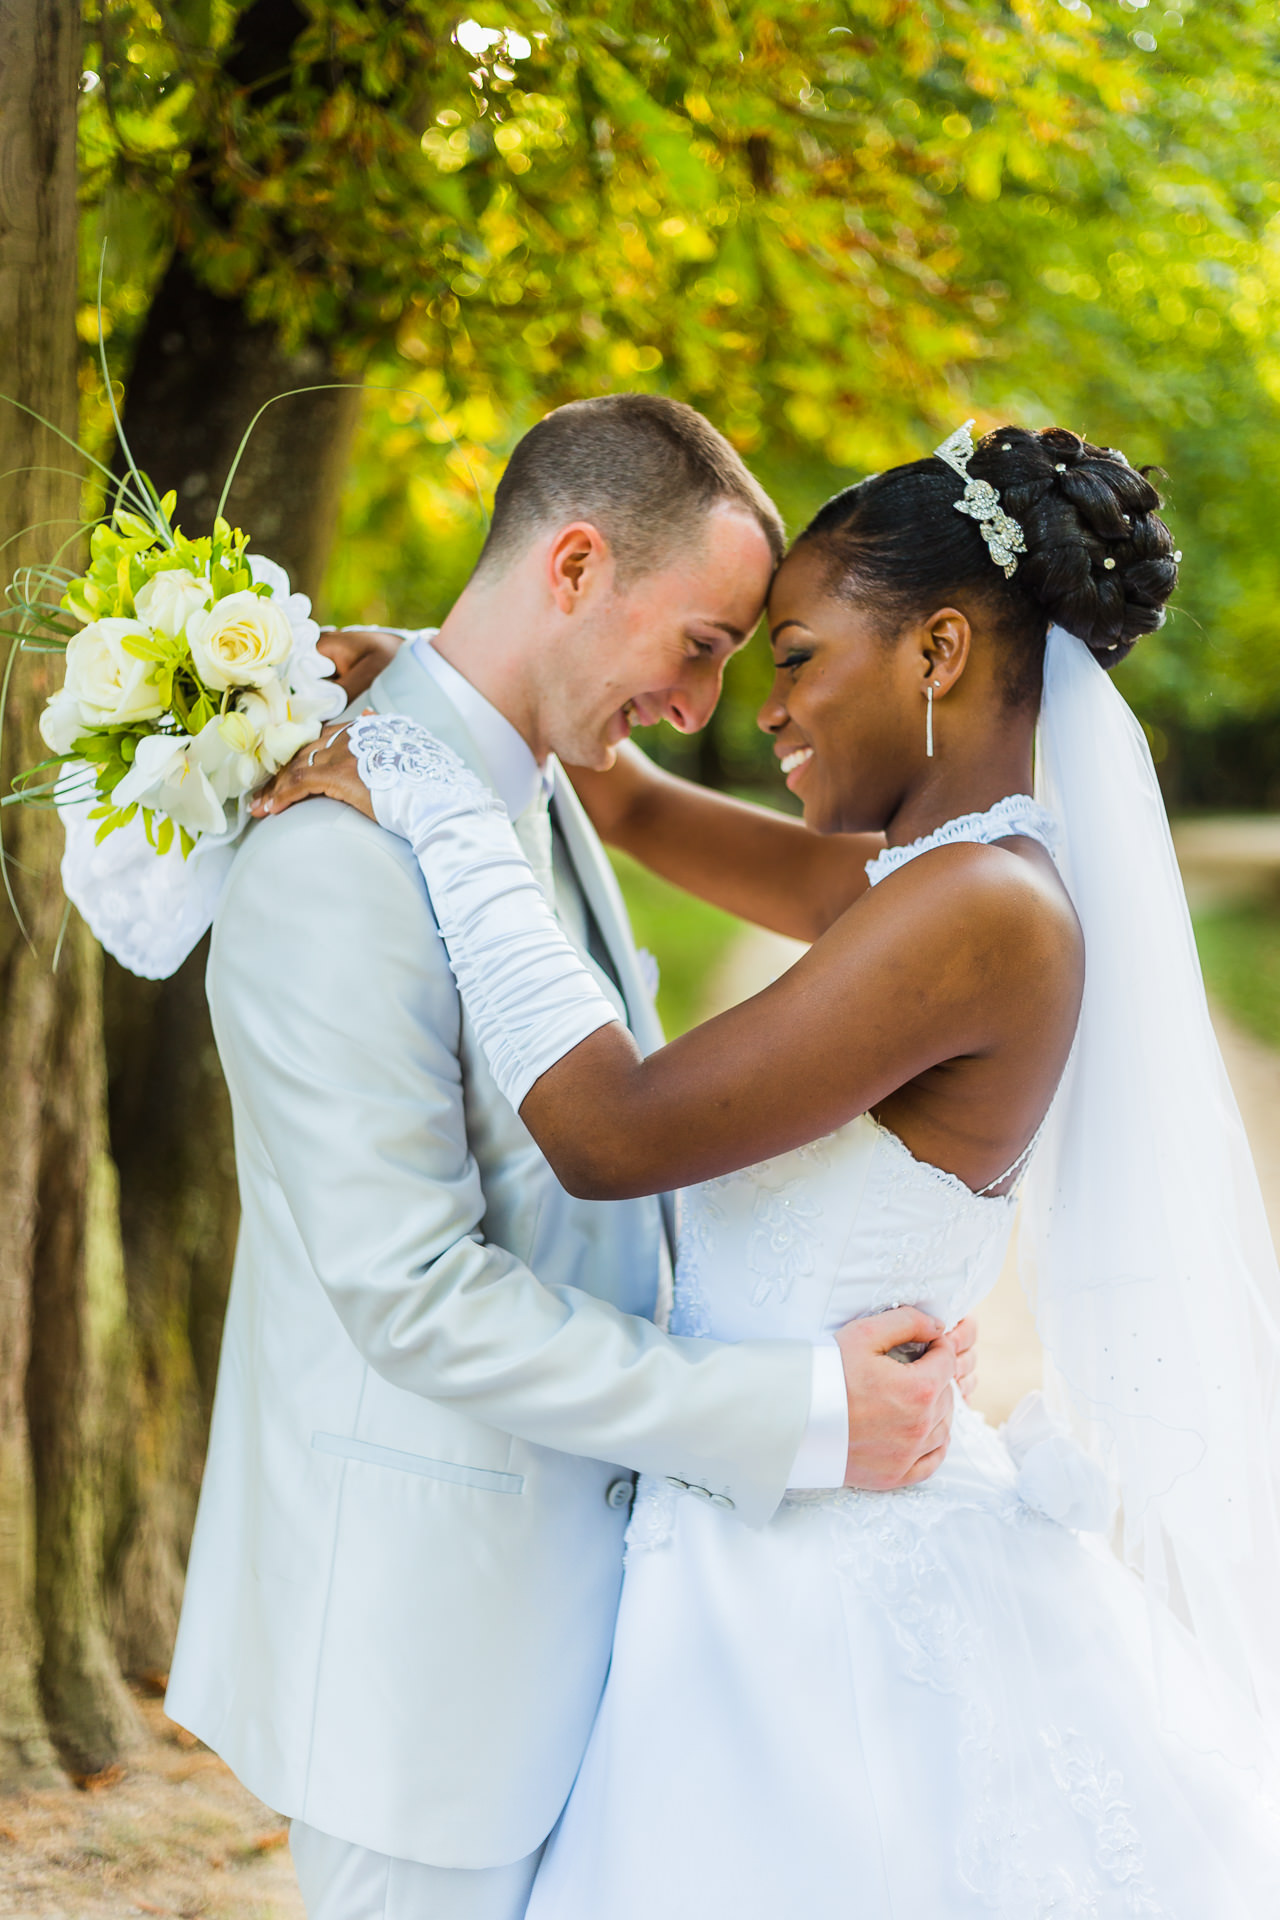 Splendide wedding photographe mariage val de marne fidelia et giovanni-5